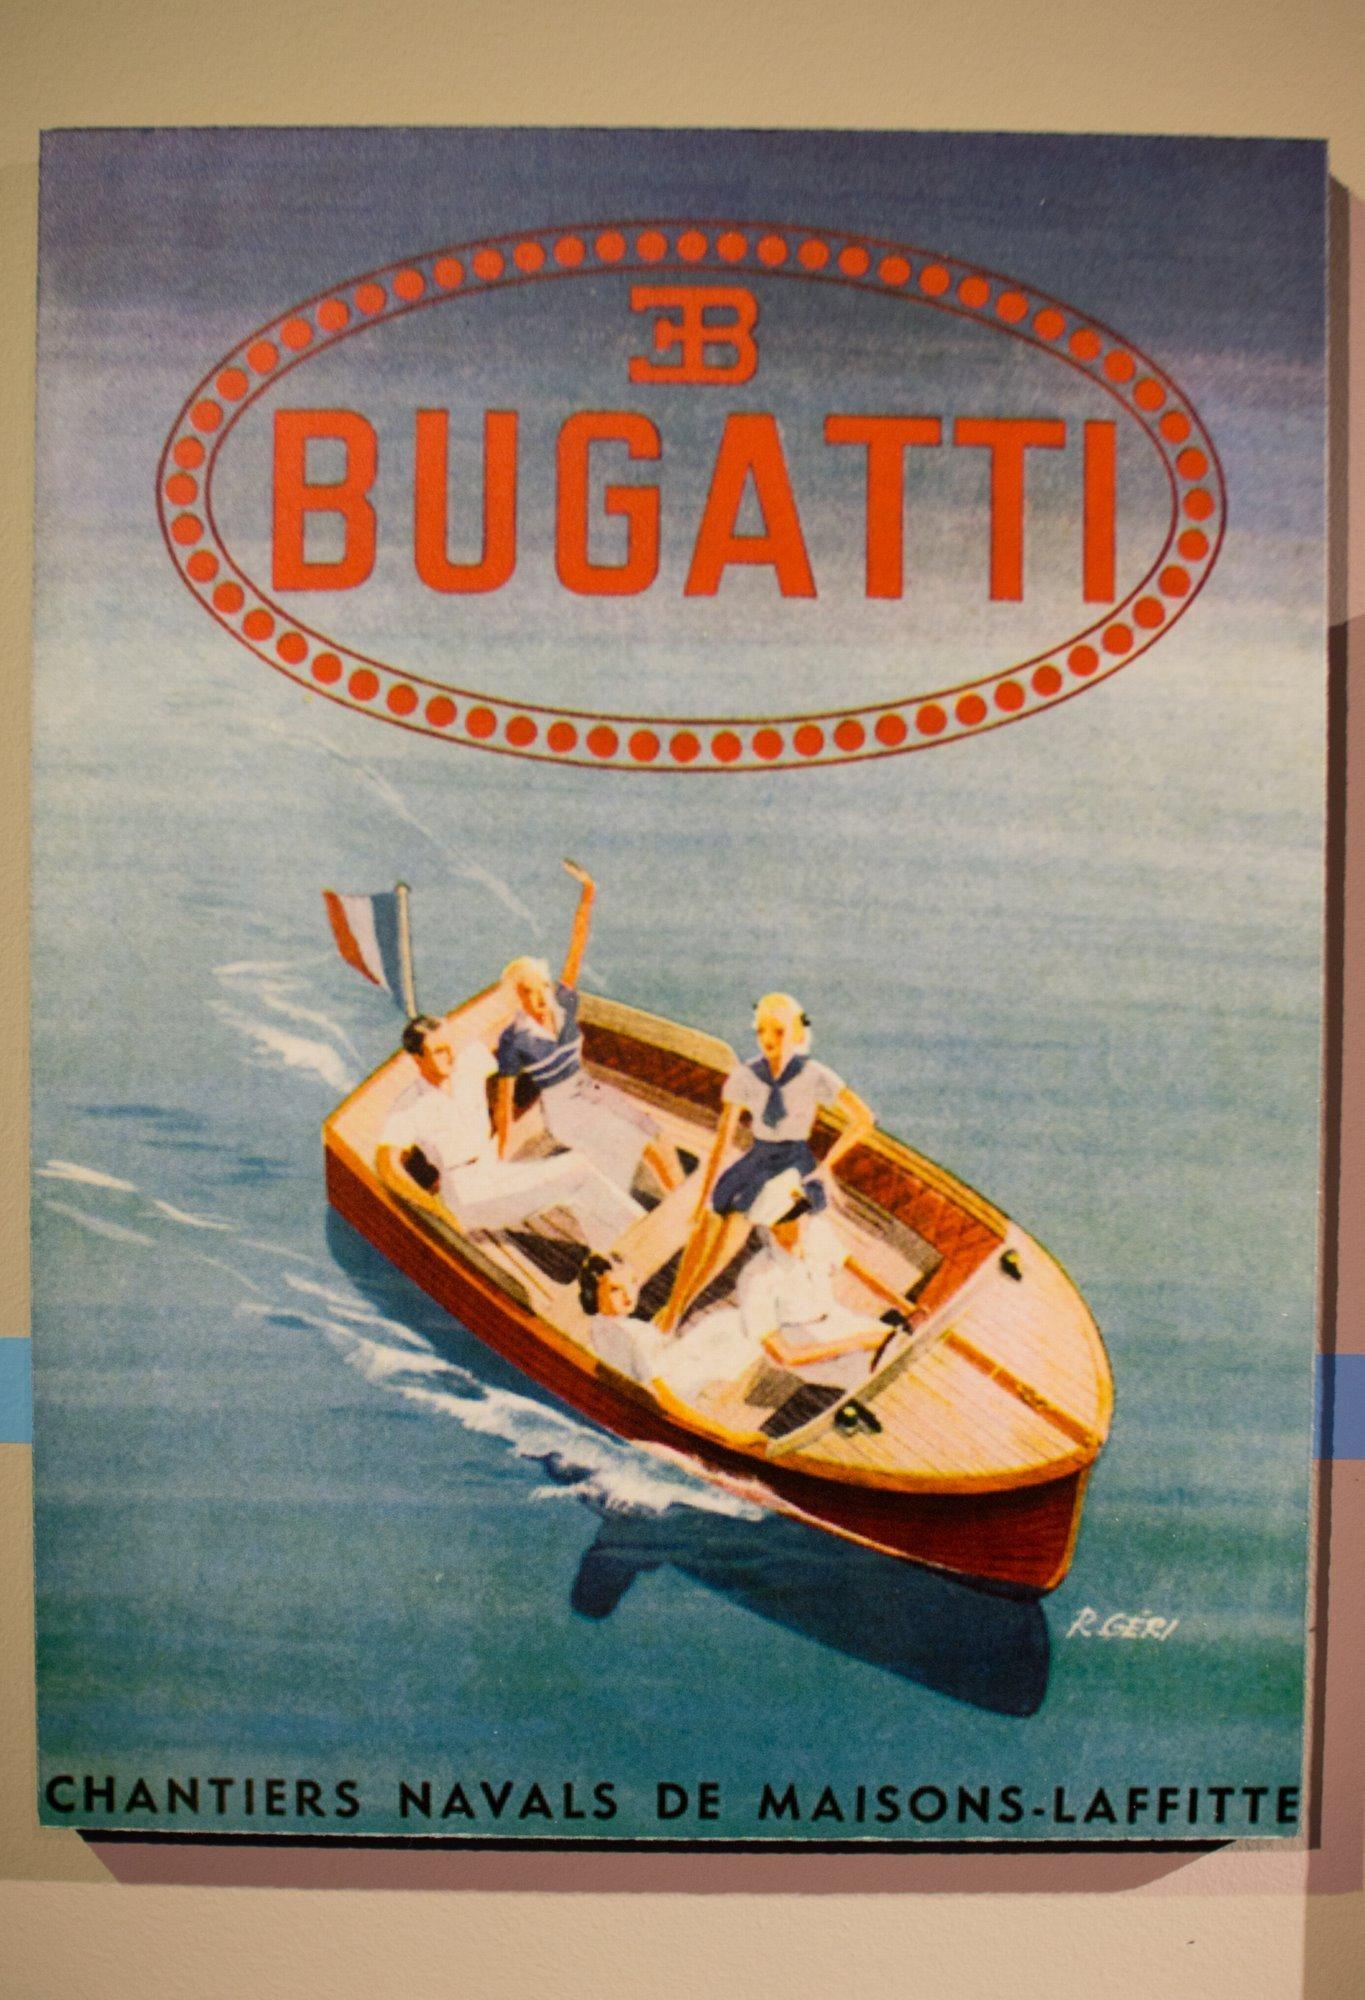 Bugattis For Sale >> Bugatti Posters/Paintings/Promos - PentaxForums.com